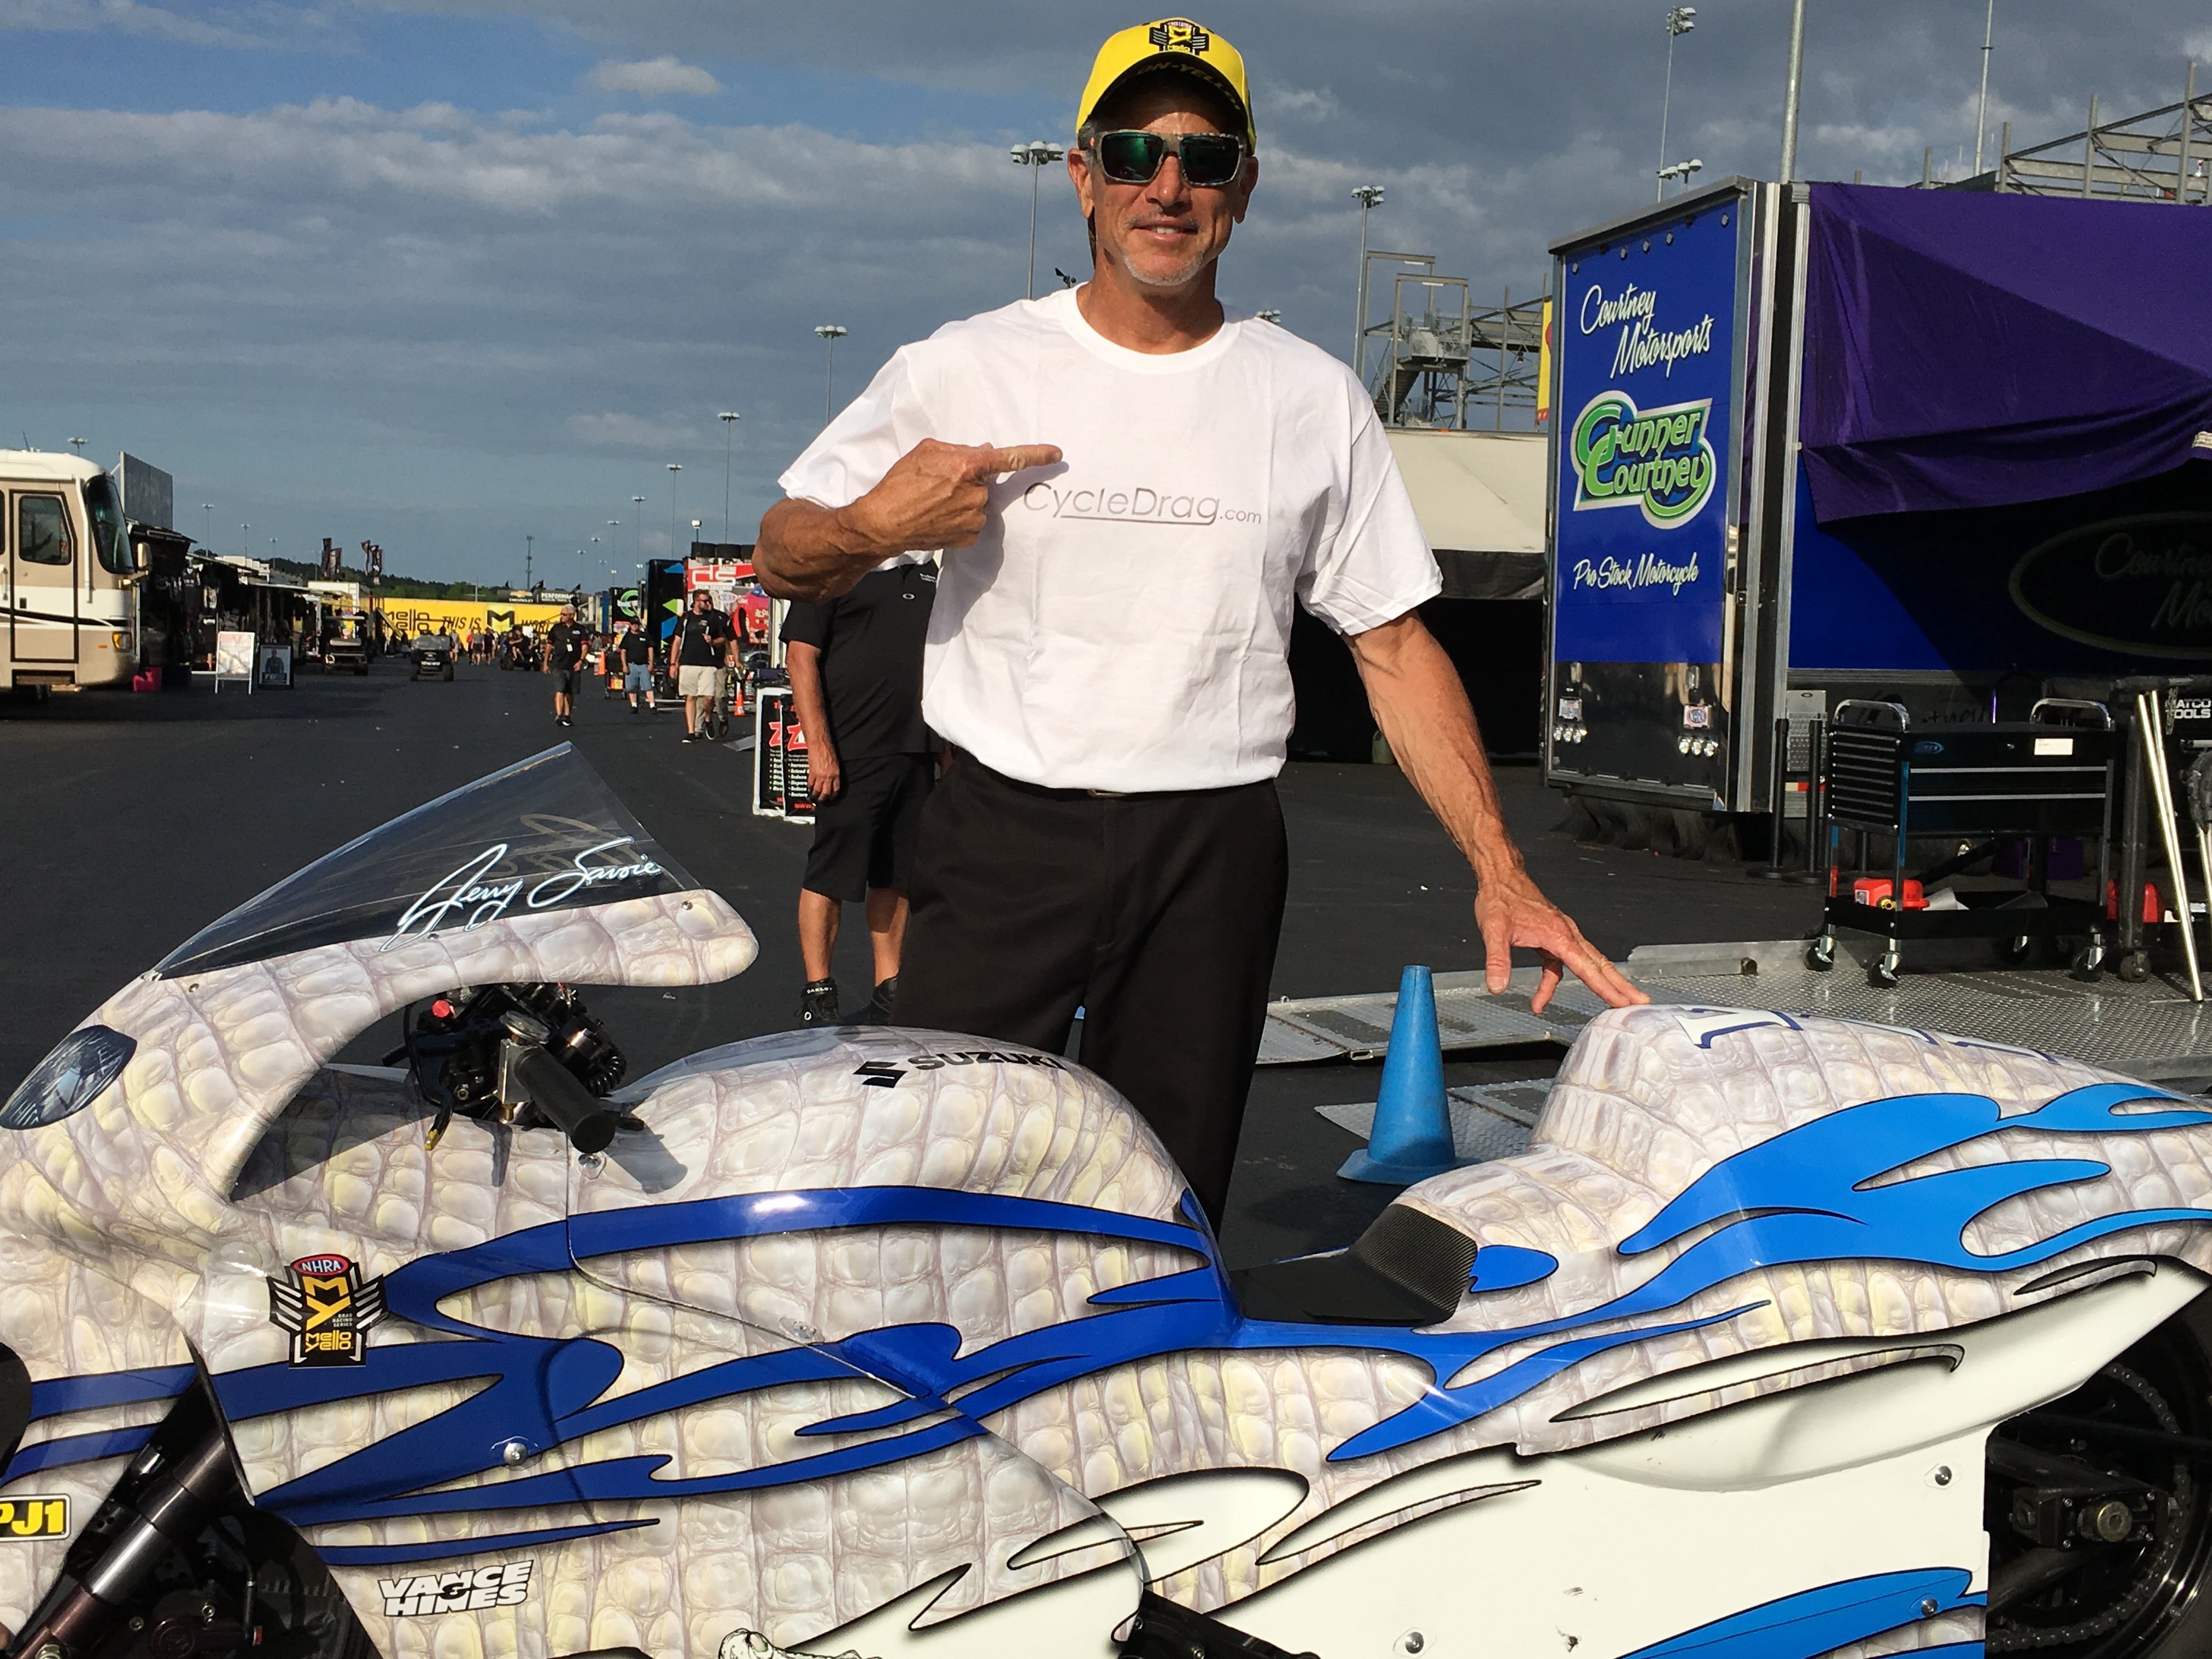 Jerry Savoie, Cycledrag.com